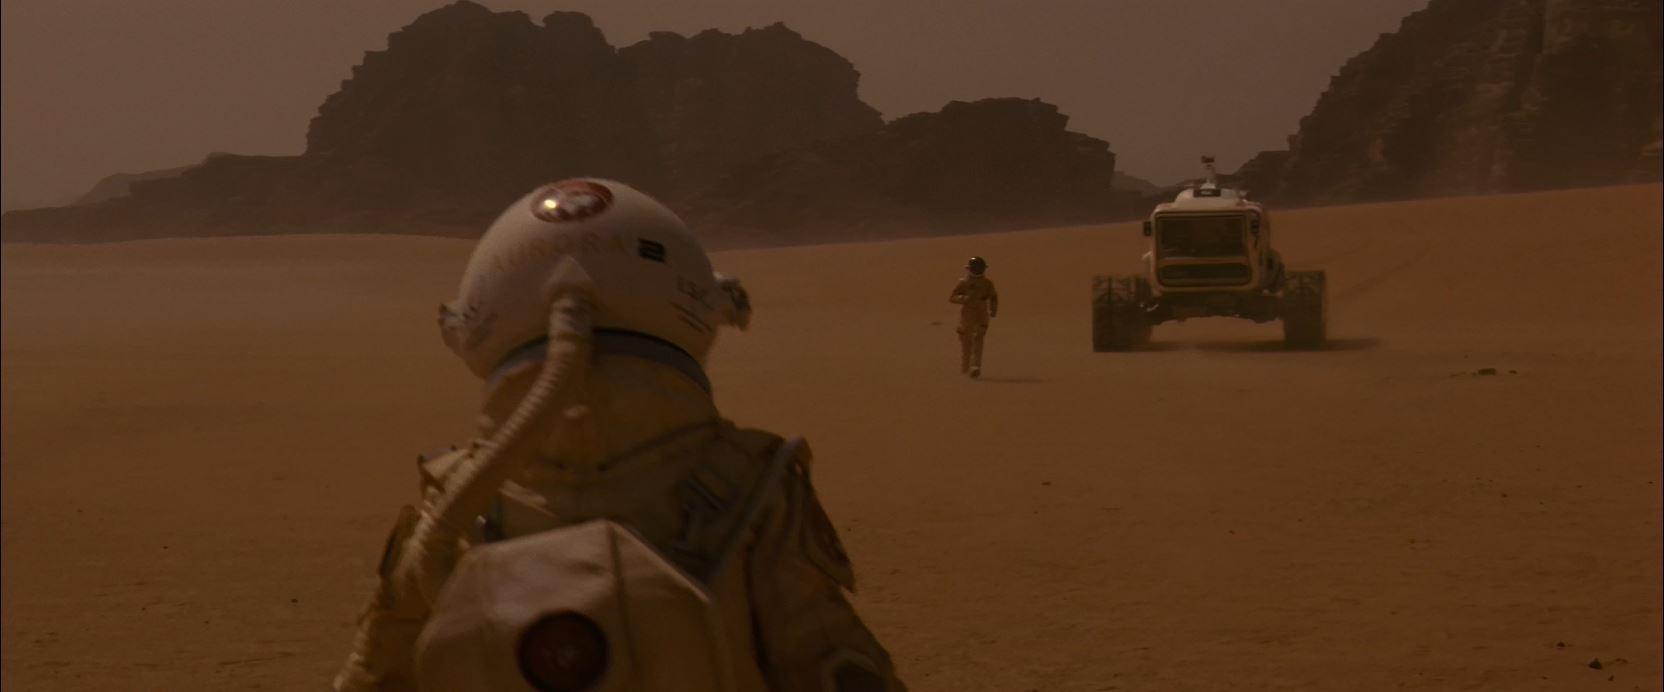 Mars in The Last Days on Mars